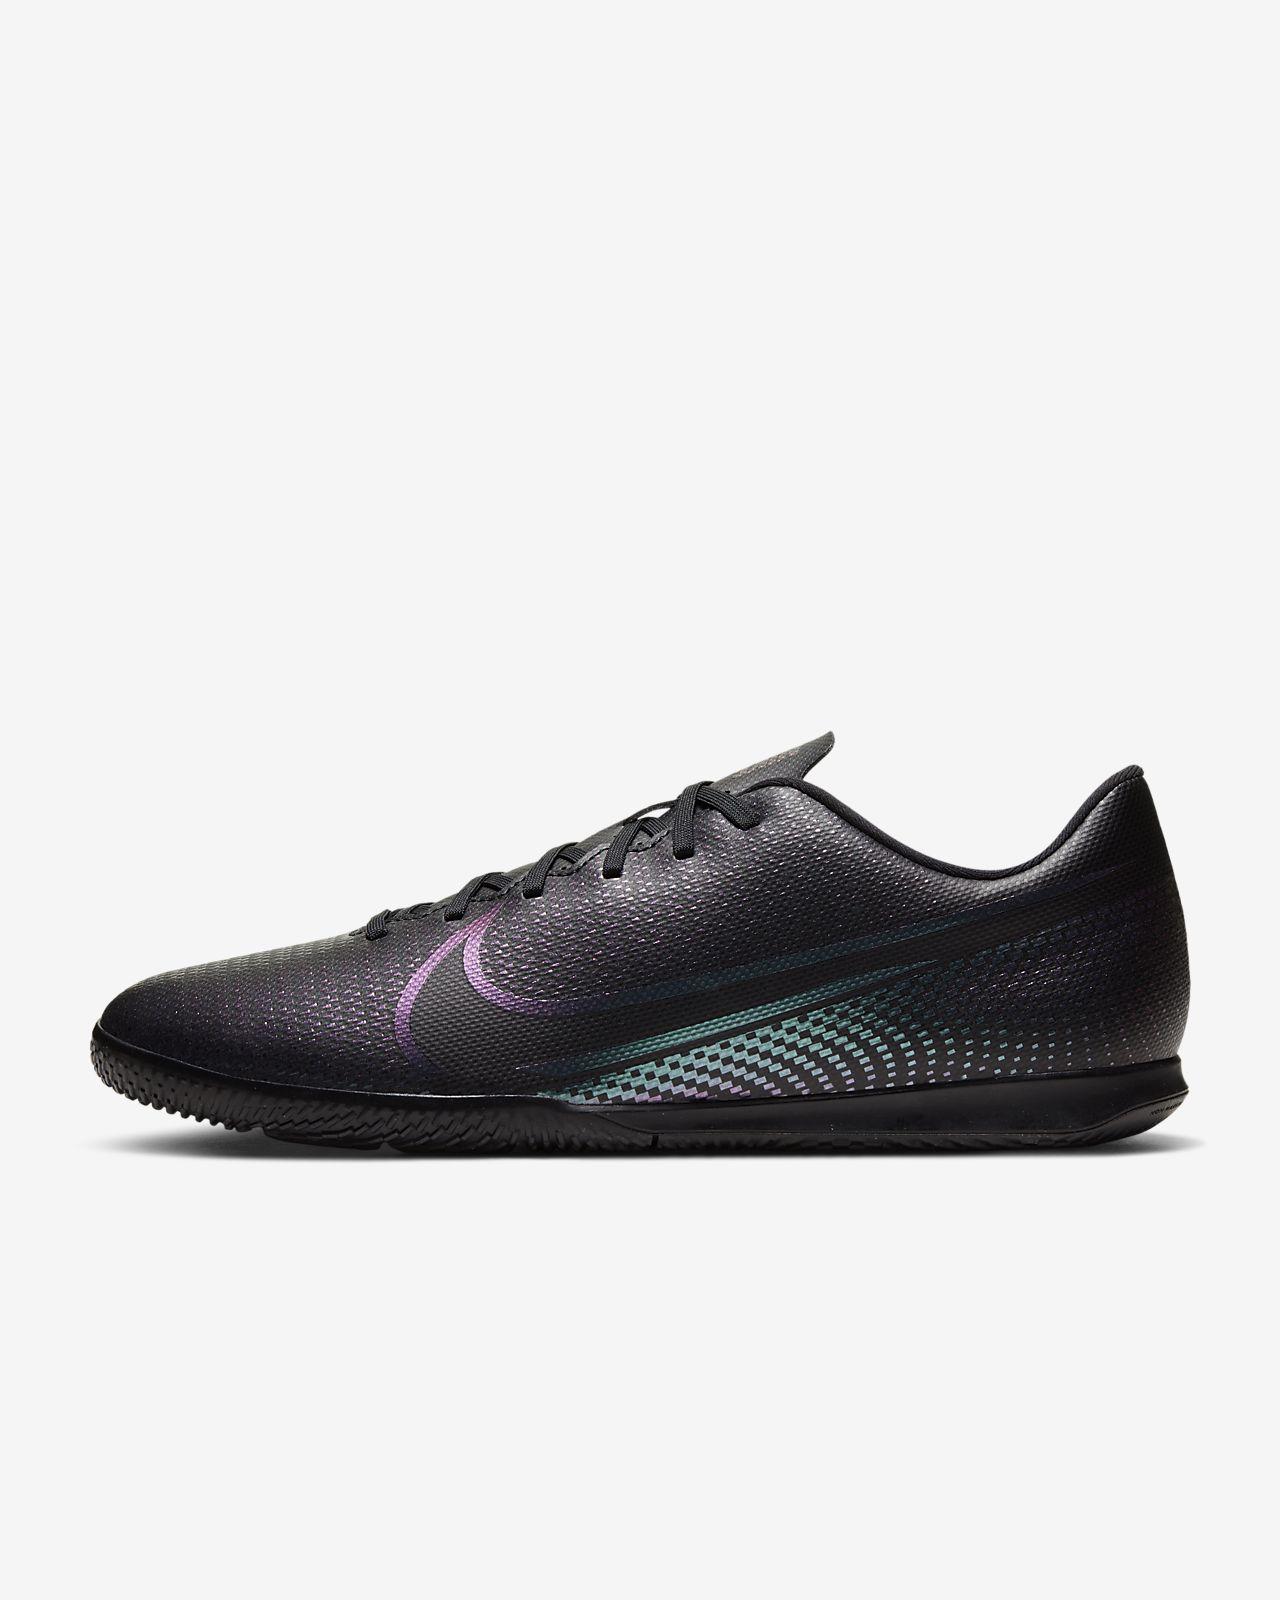 Scarpa da calcio per campi indoor/cemento Nike Mercurial Vapor 13 Club IC